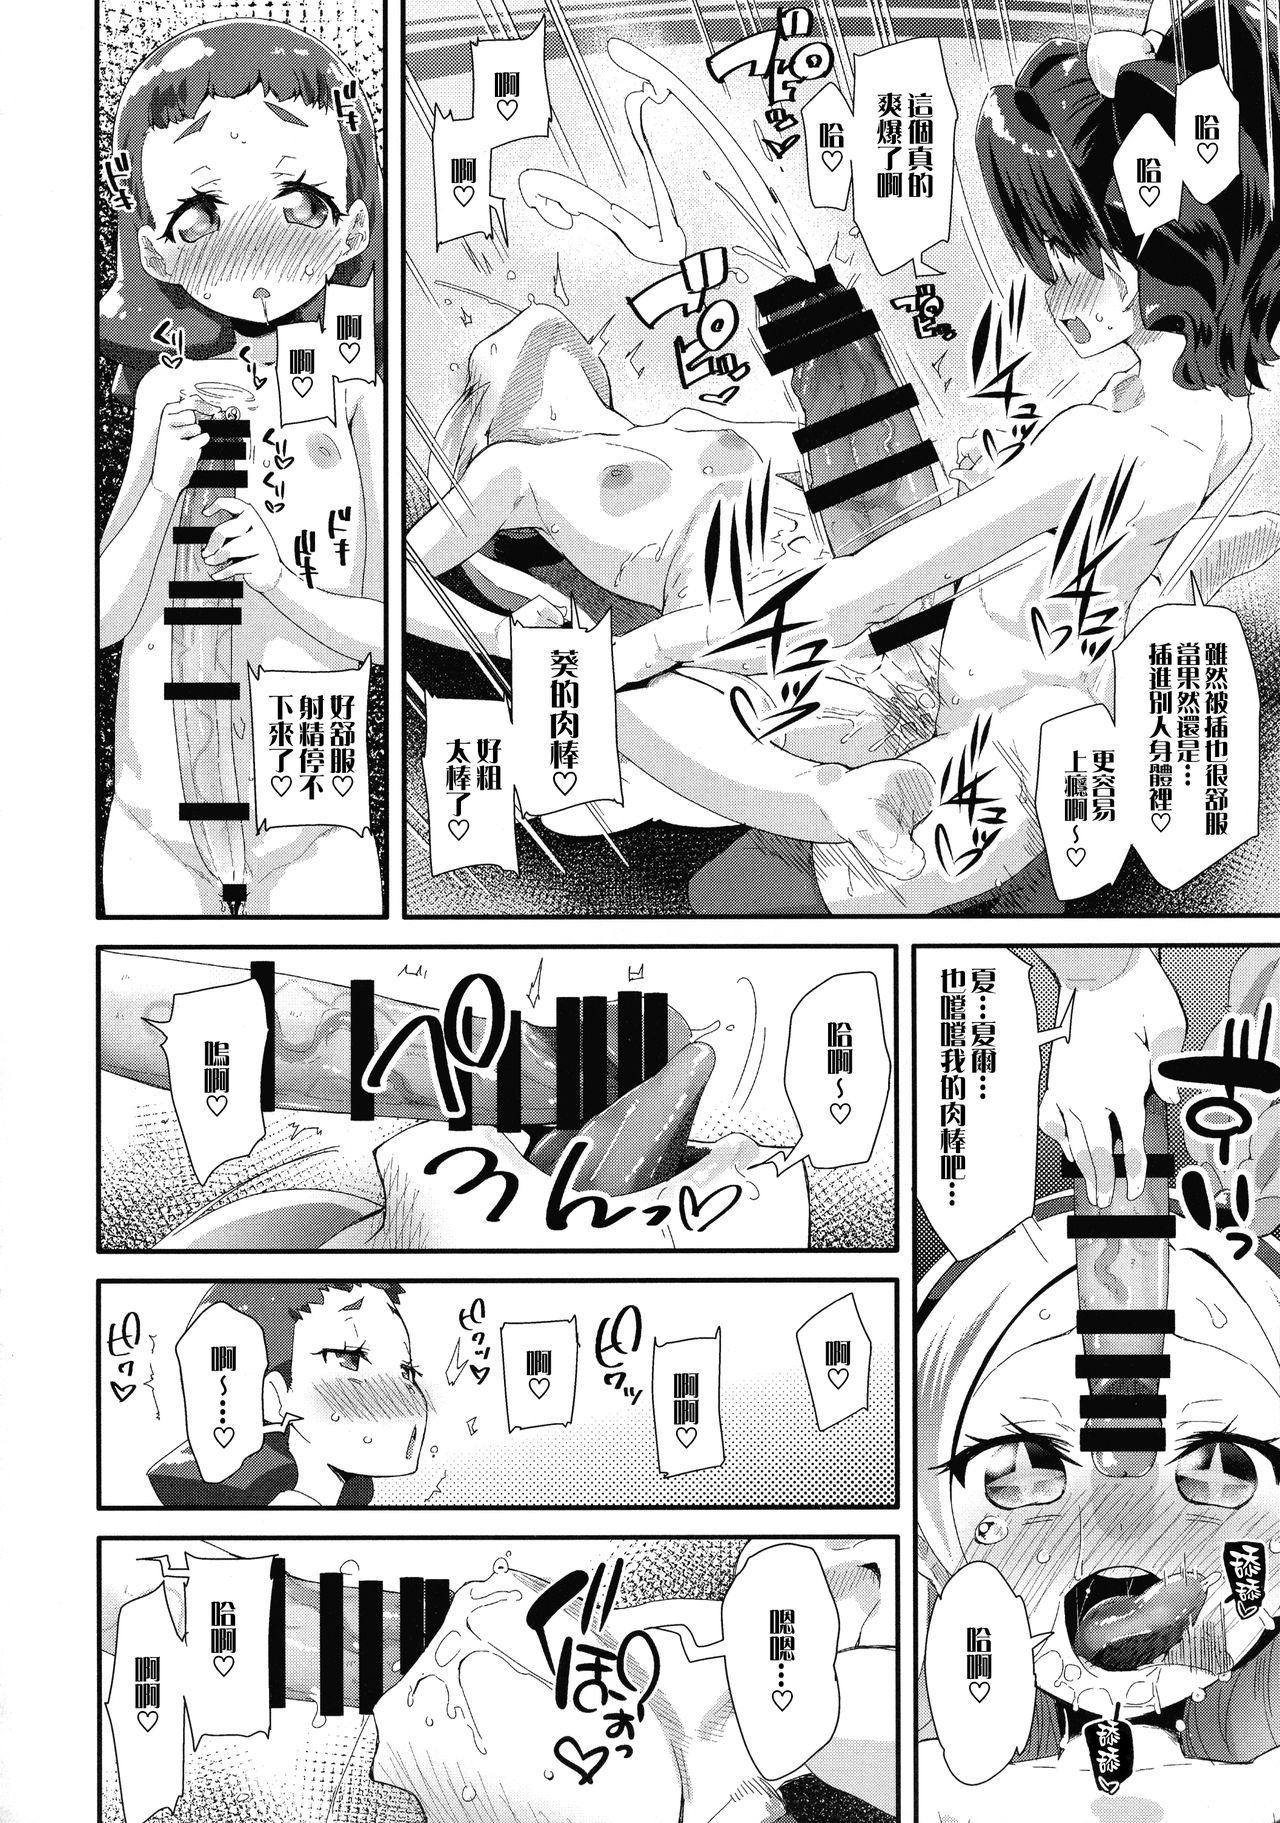 Hiru no KiraPâti e Youkoso 21